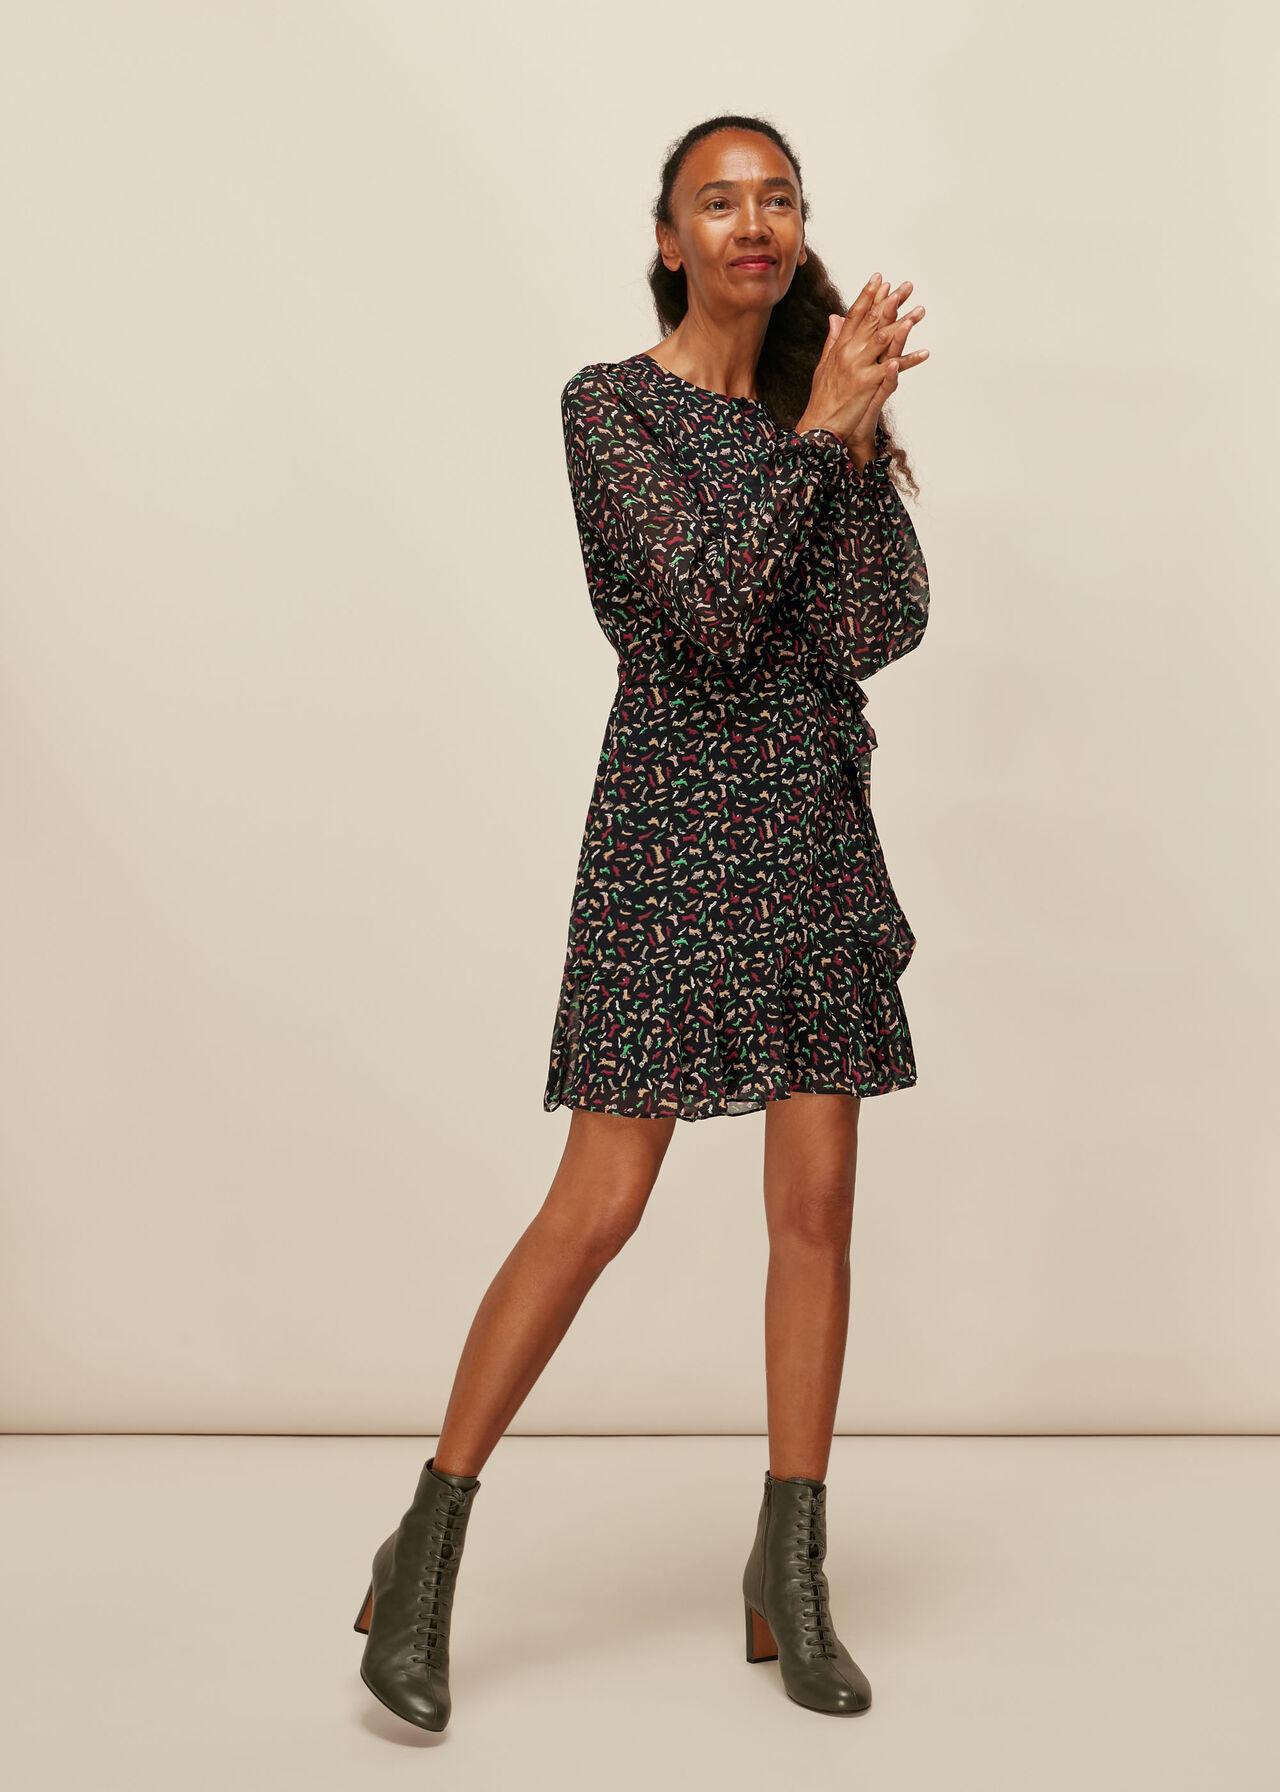 Shoe Print Dress